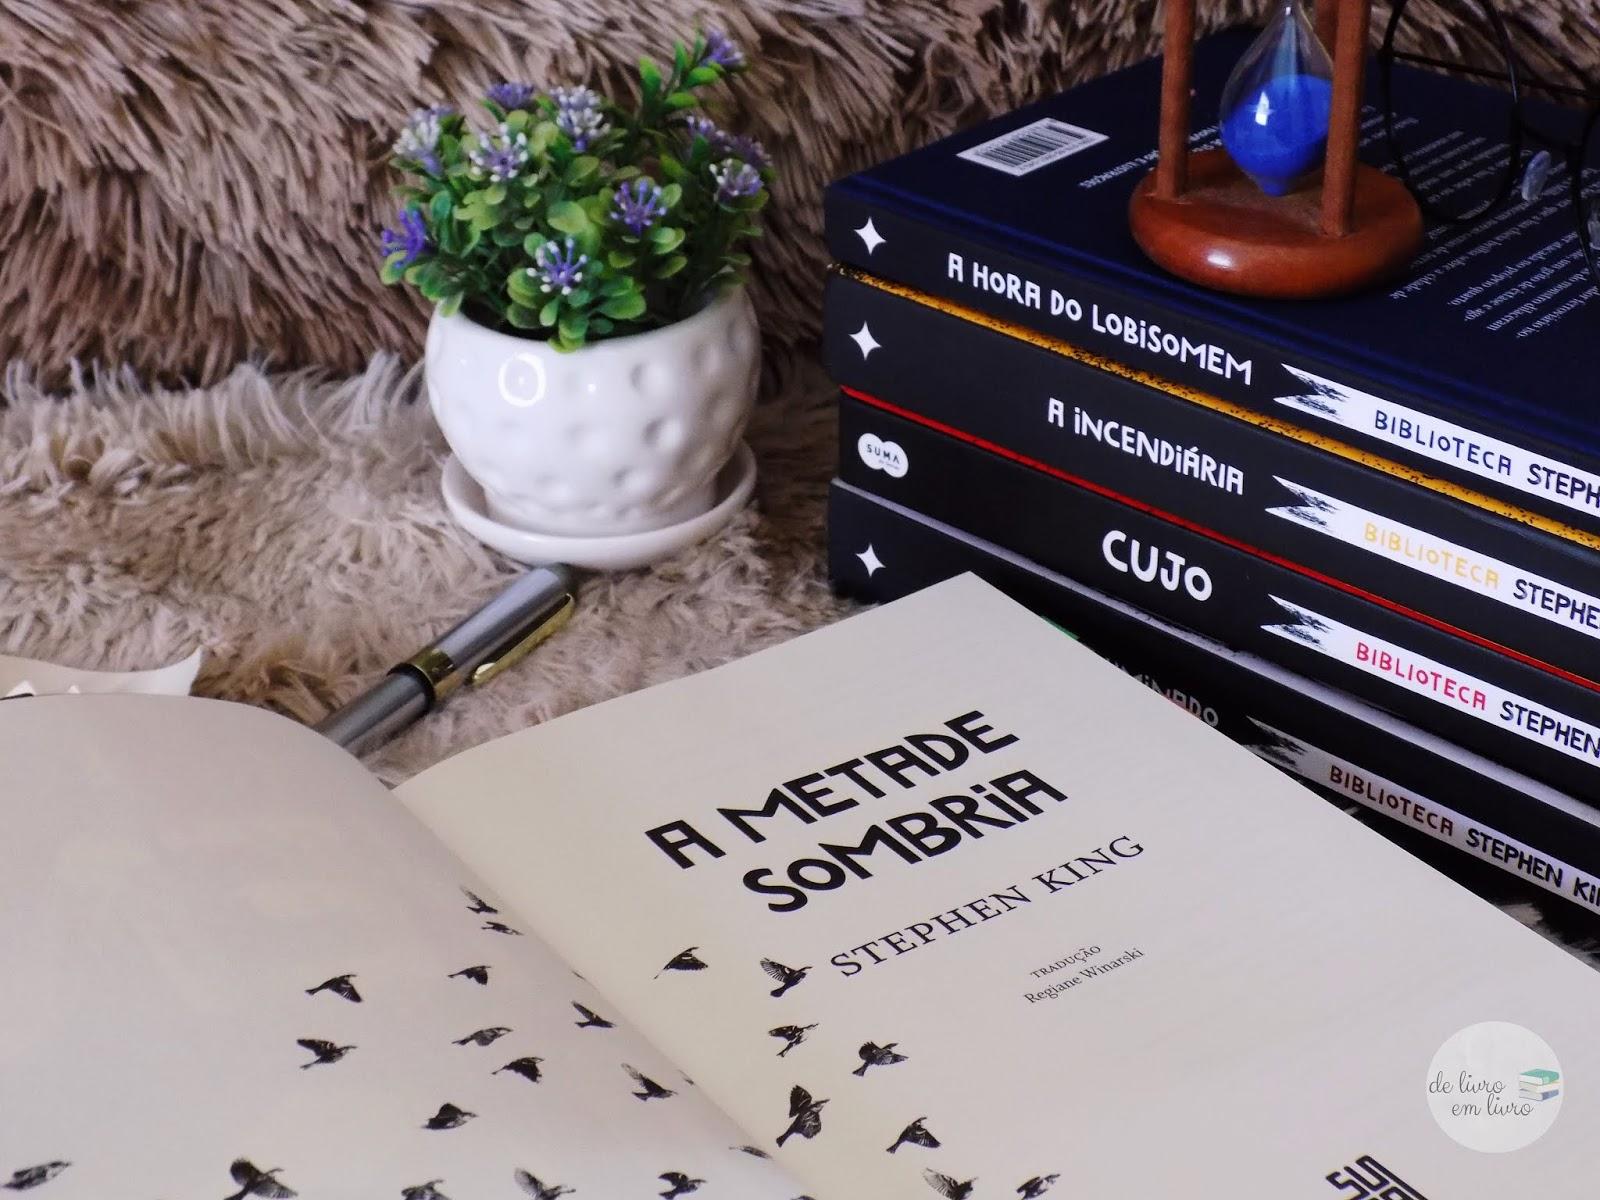 A Metade Sombria - Stephen King